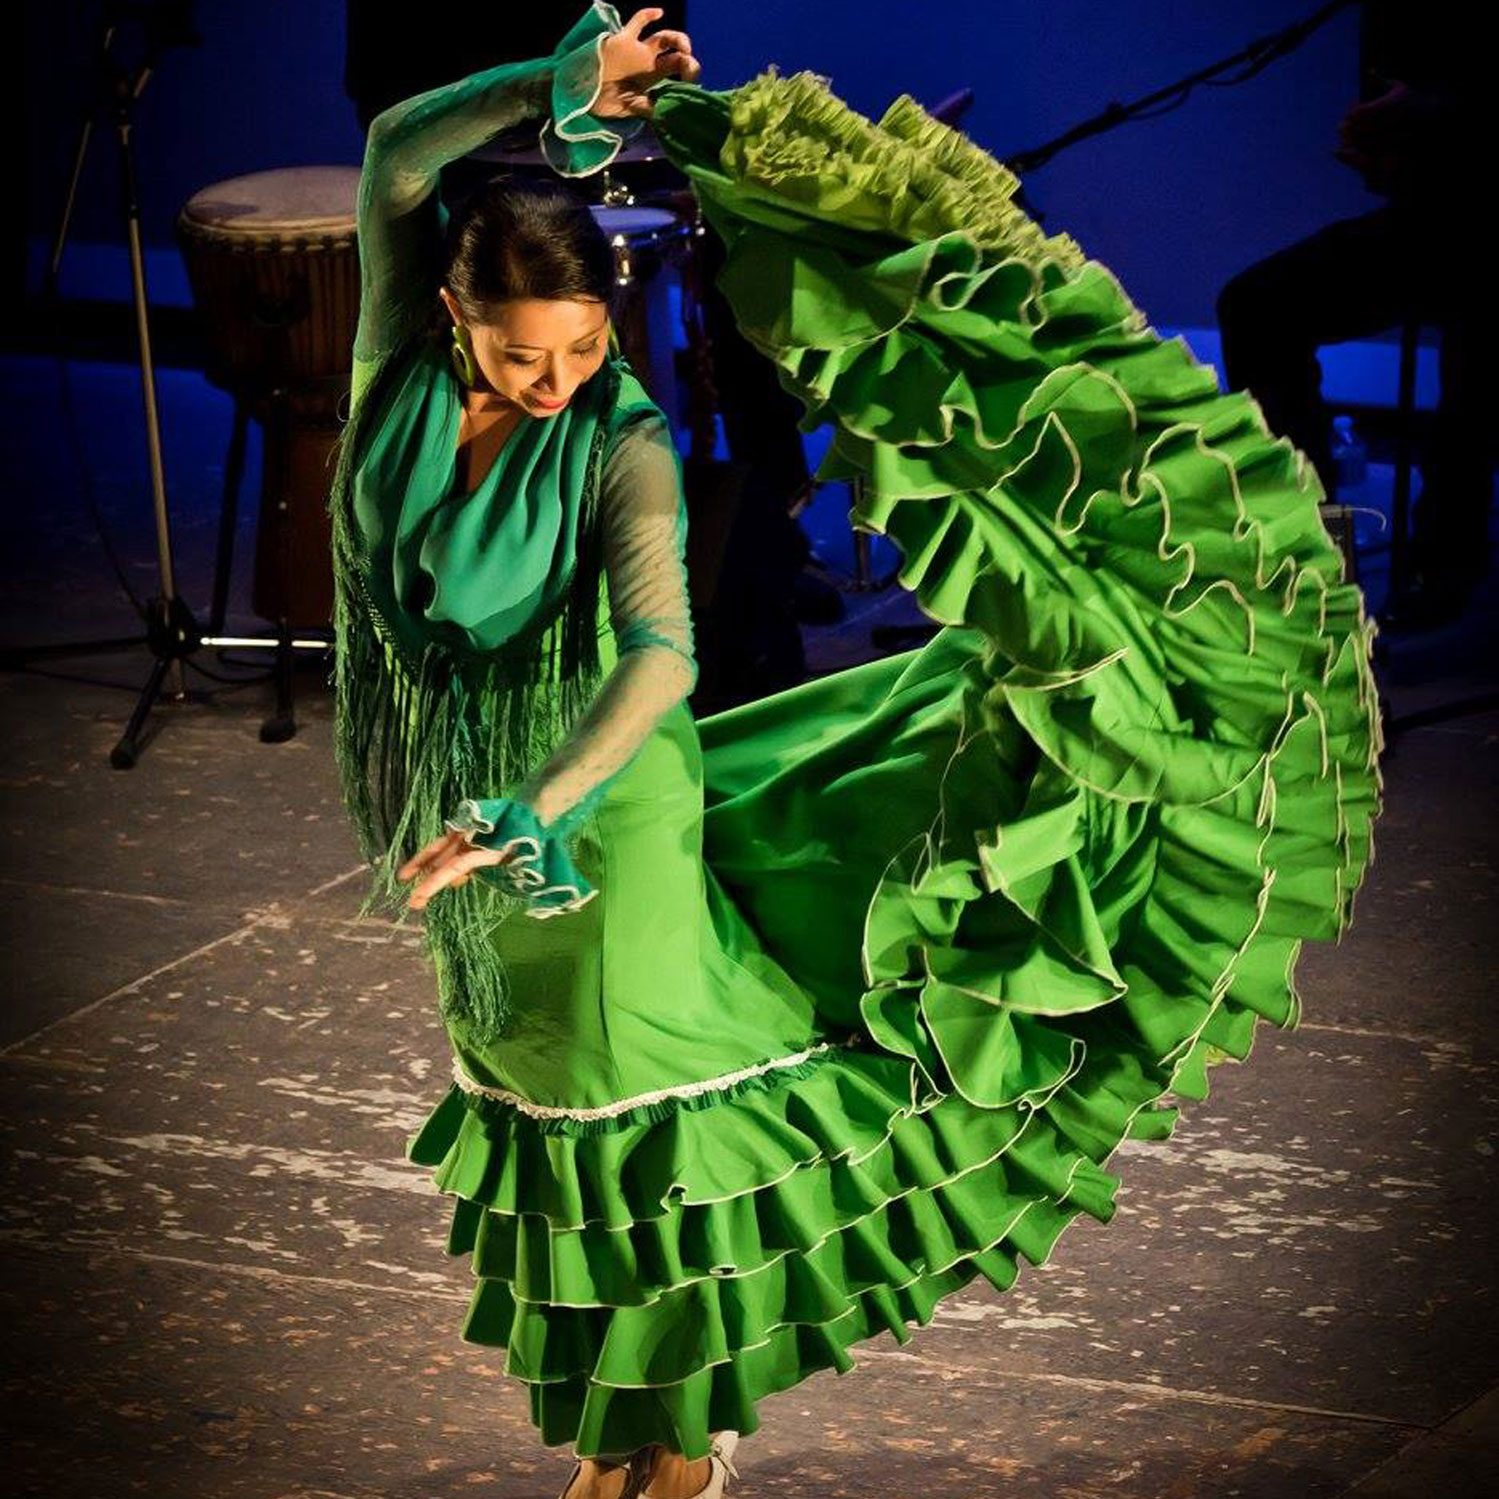 Flamenco artist Kasandra Lea poses